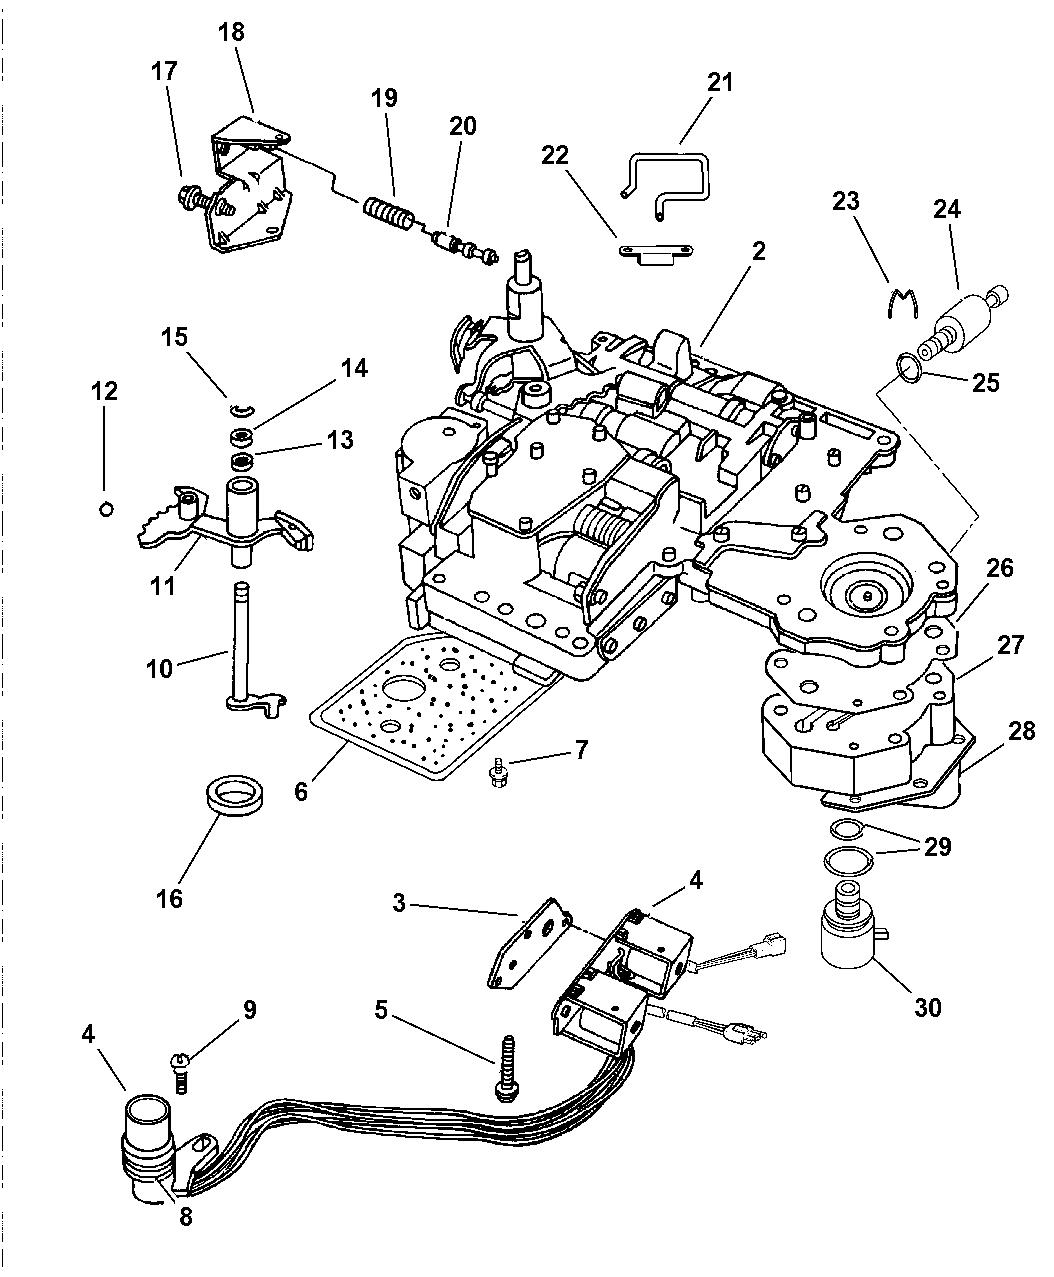 98 Dodge Durango Engine Diagram - Wiring Diagram Networks